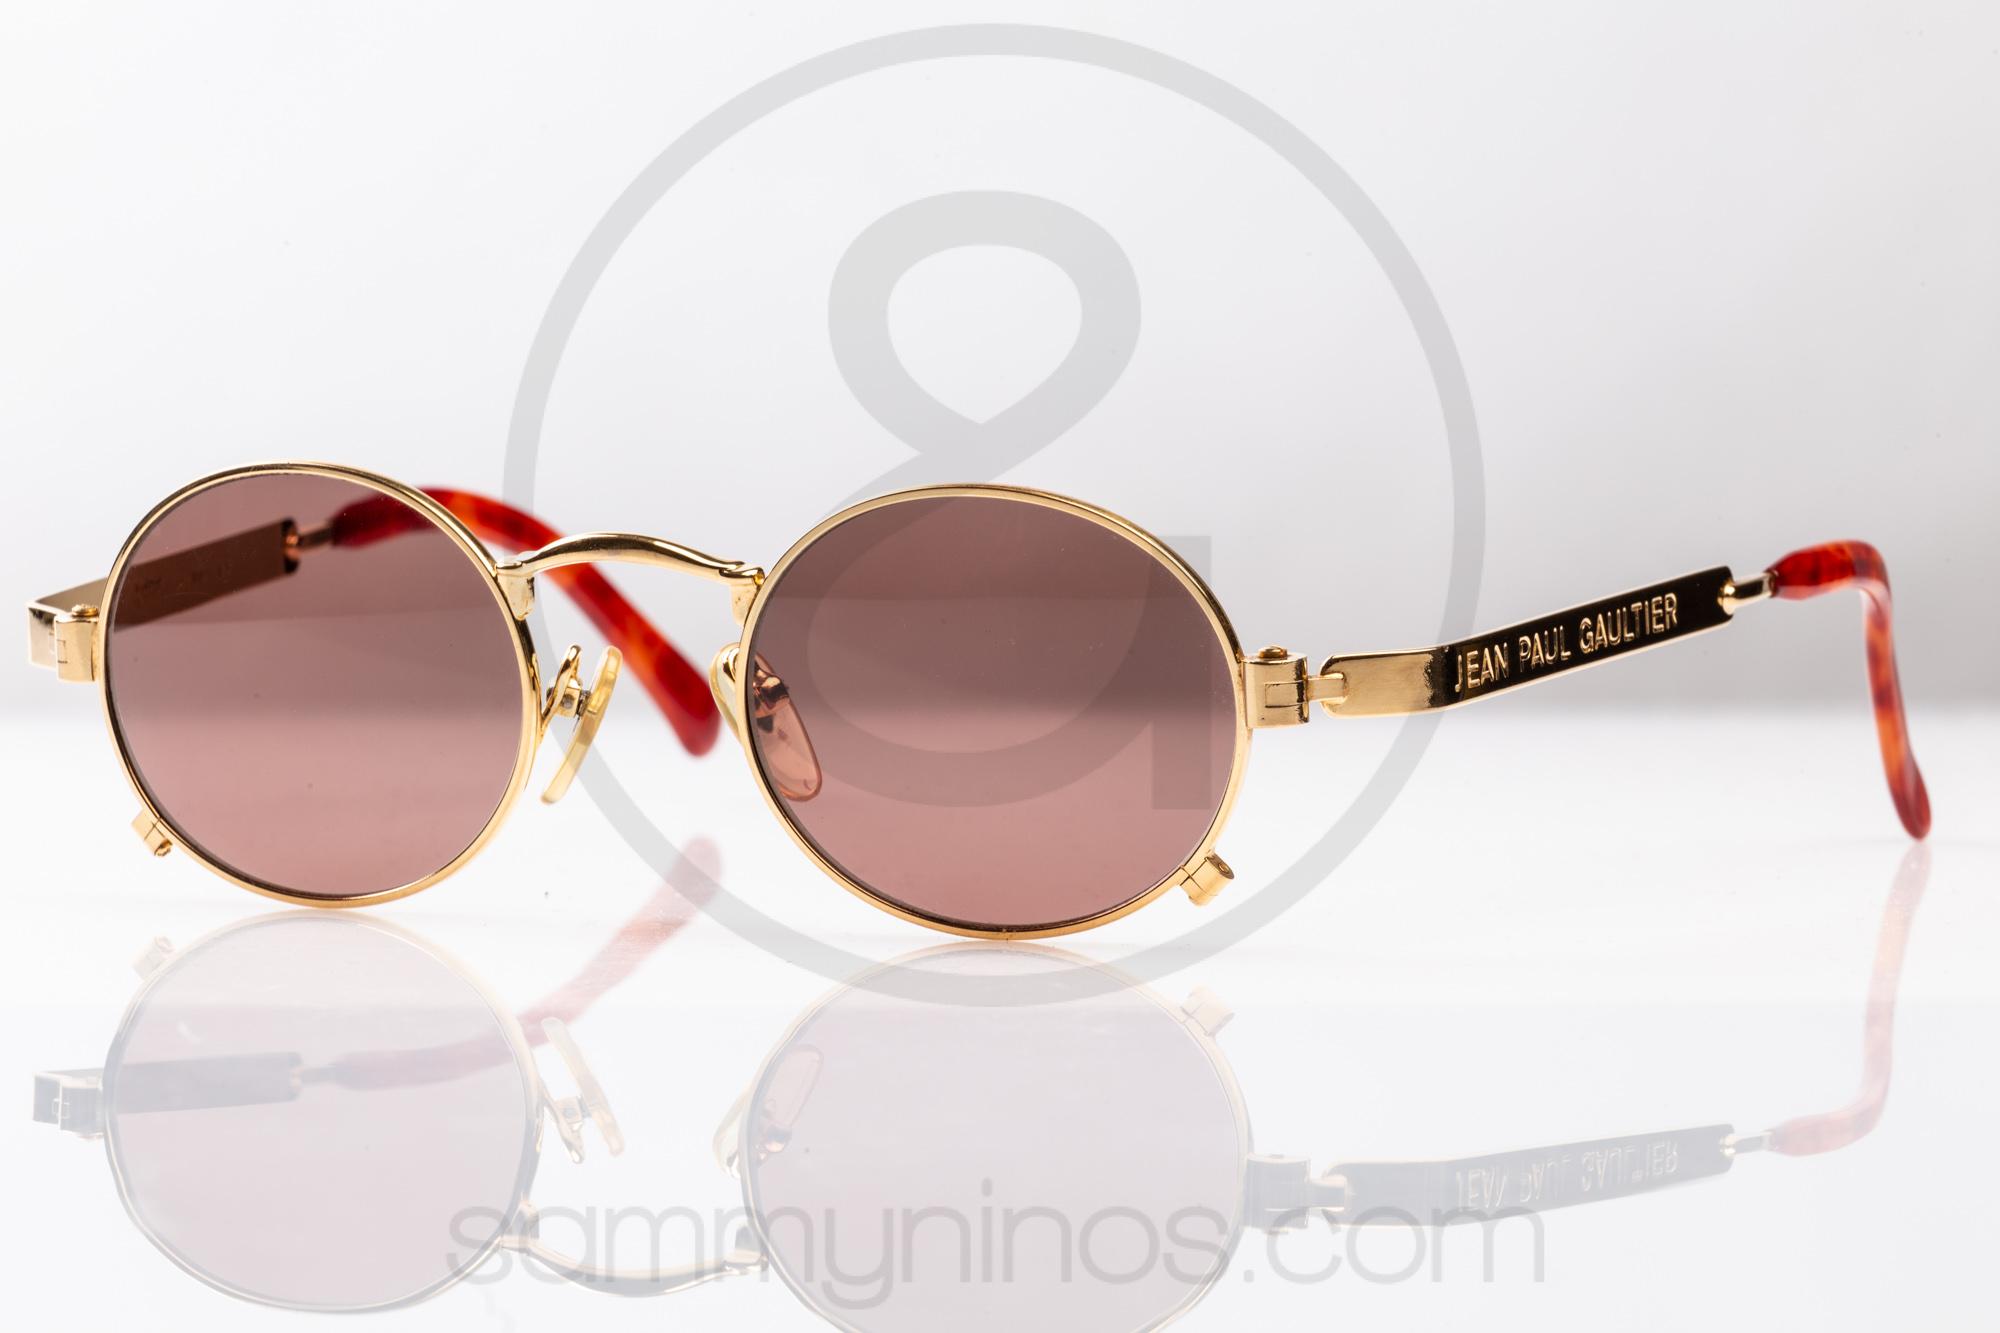 94bc22b11 Jean Paul Gaultier Sunglasses Men Source · Jean Paul Gaultier 56 1173 Sammy  & Nino s Store